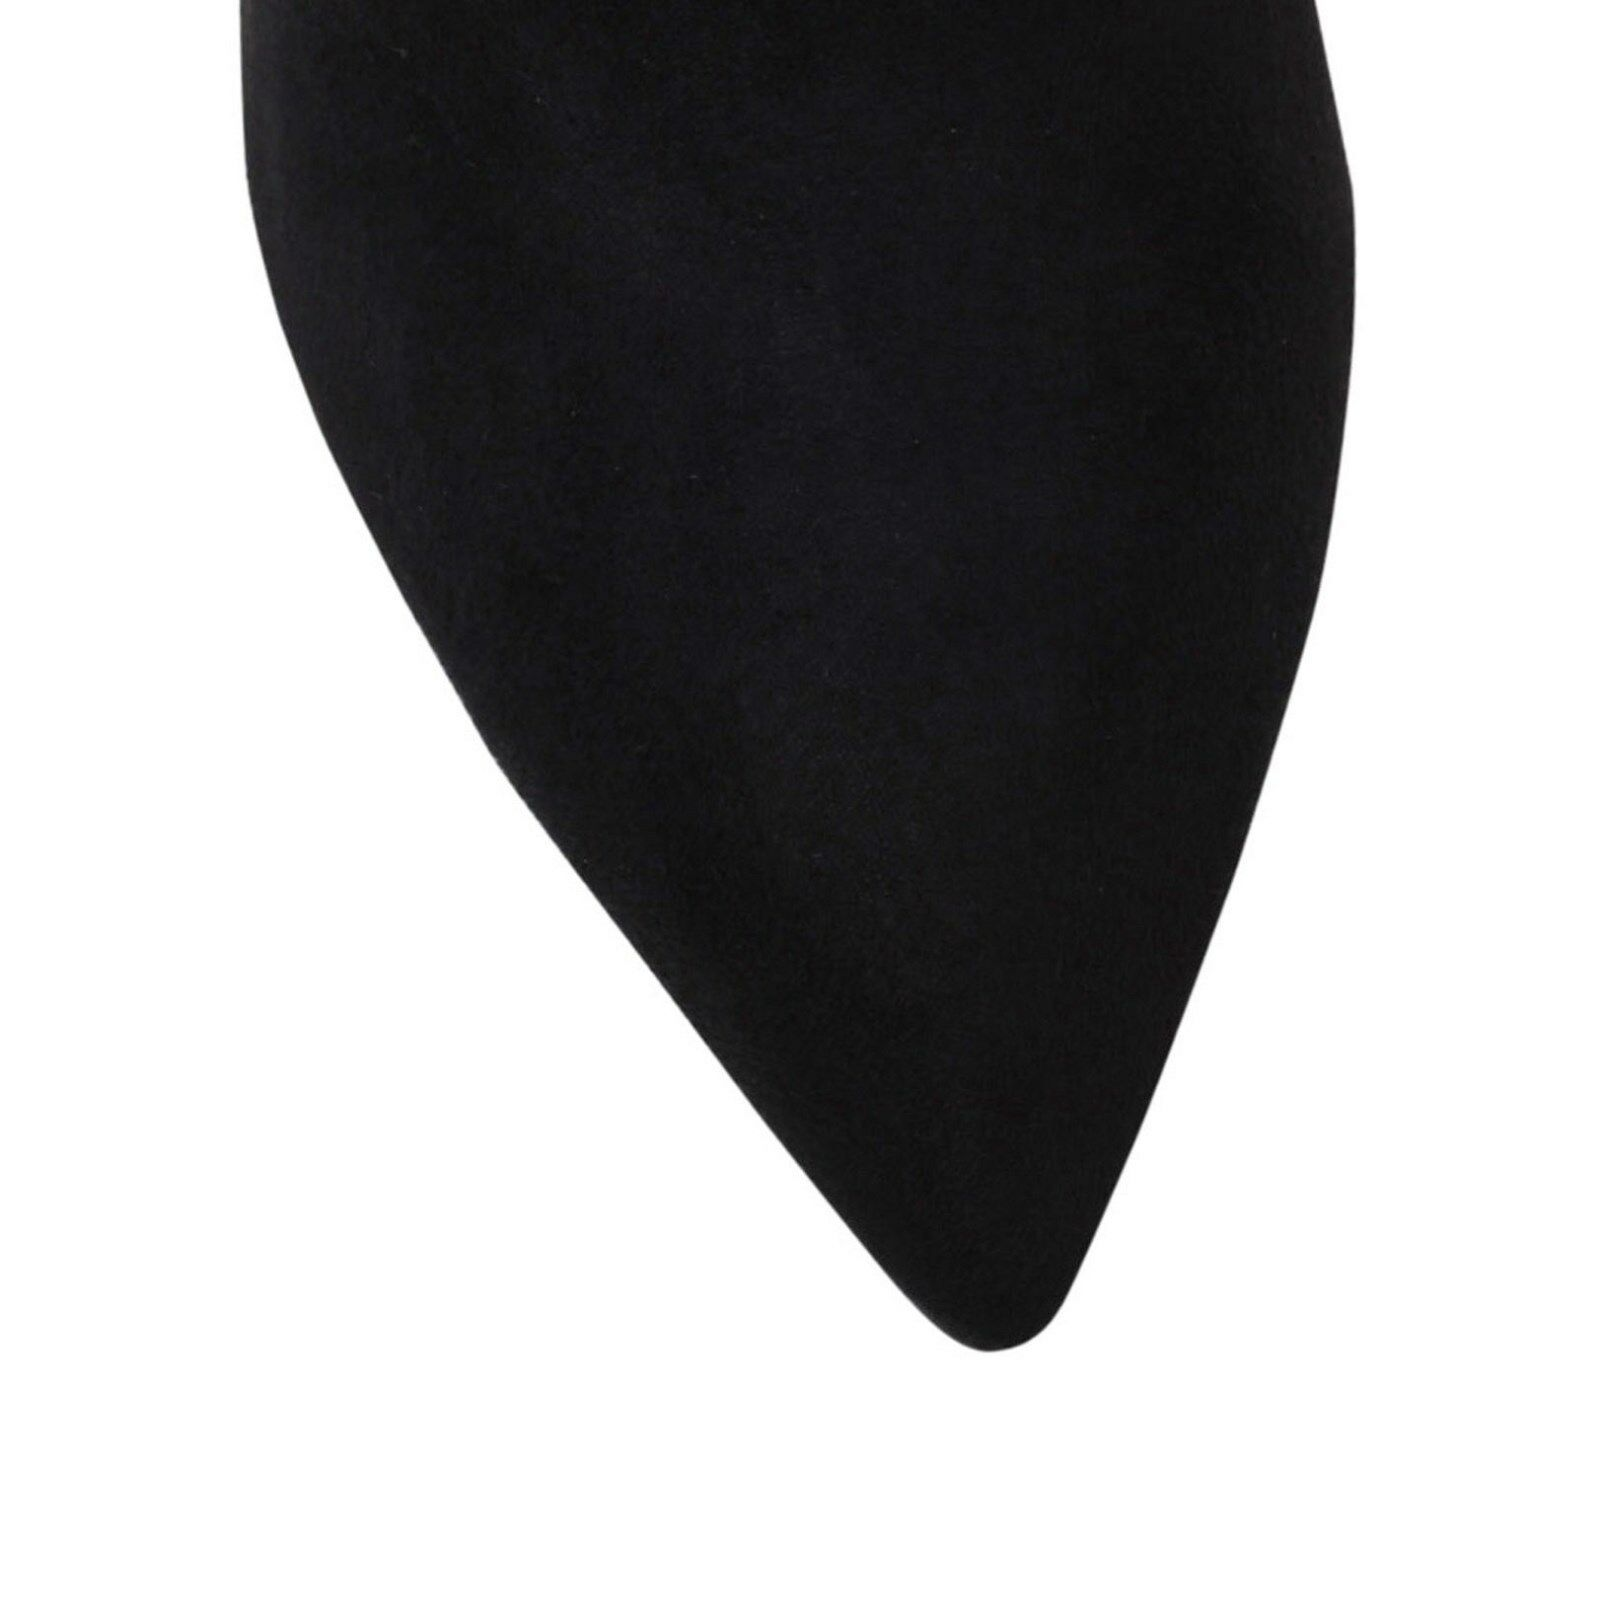 BNWOB 6 7 8 MISS MISS MISS KG KURT GEIGER SLIMLINE BLACK OVER THE KNEE THIGH OTK Stiefel 9ad5da